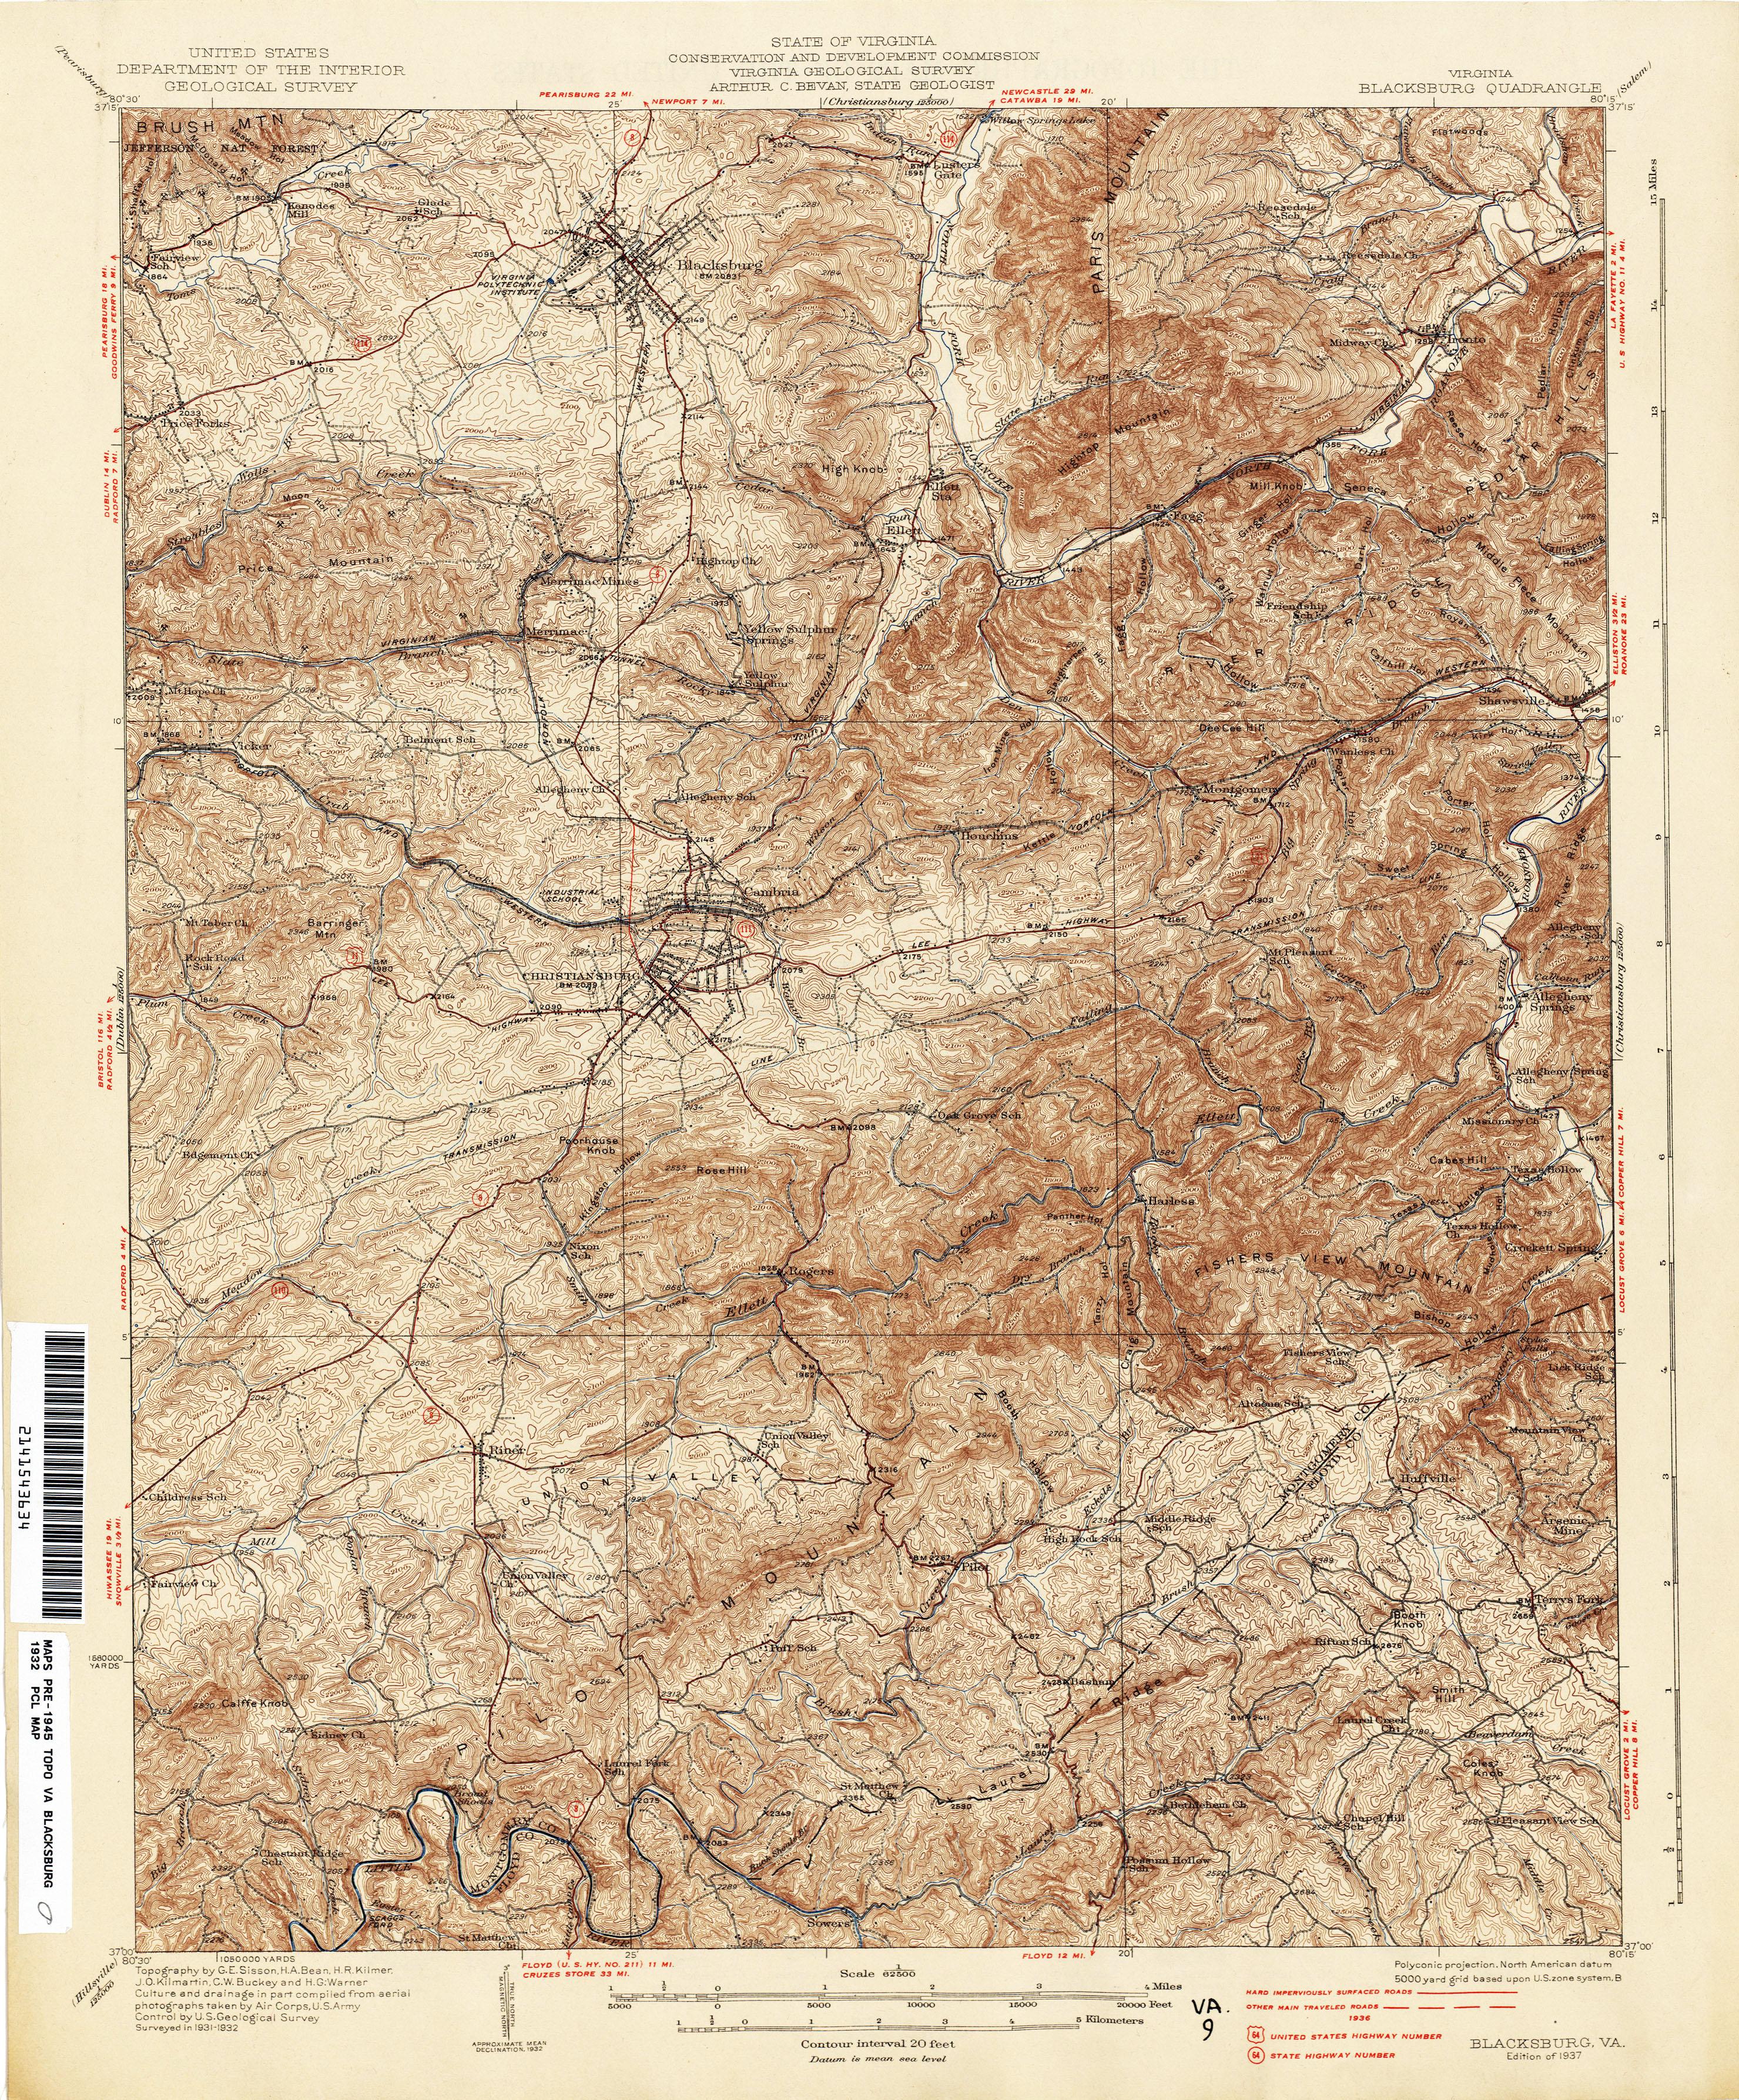 Virginia Historical Topographic Maps - Perry-Castañeda Map